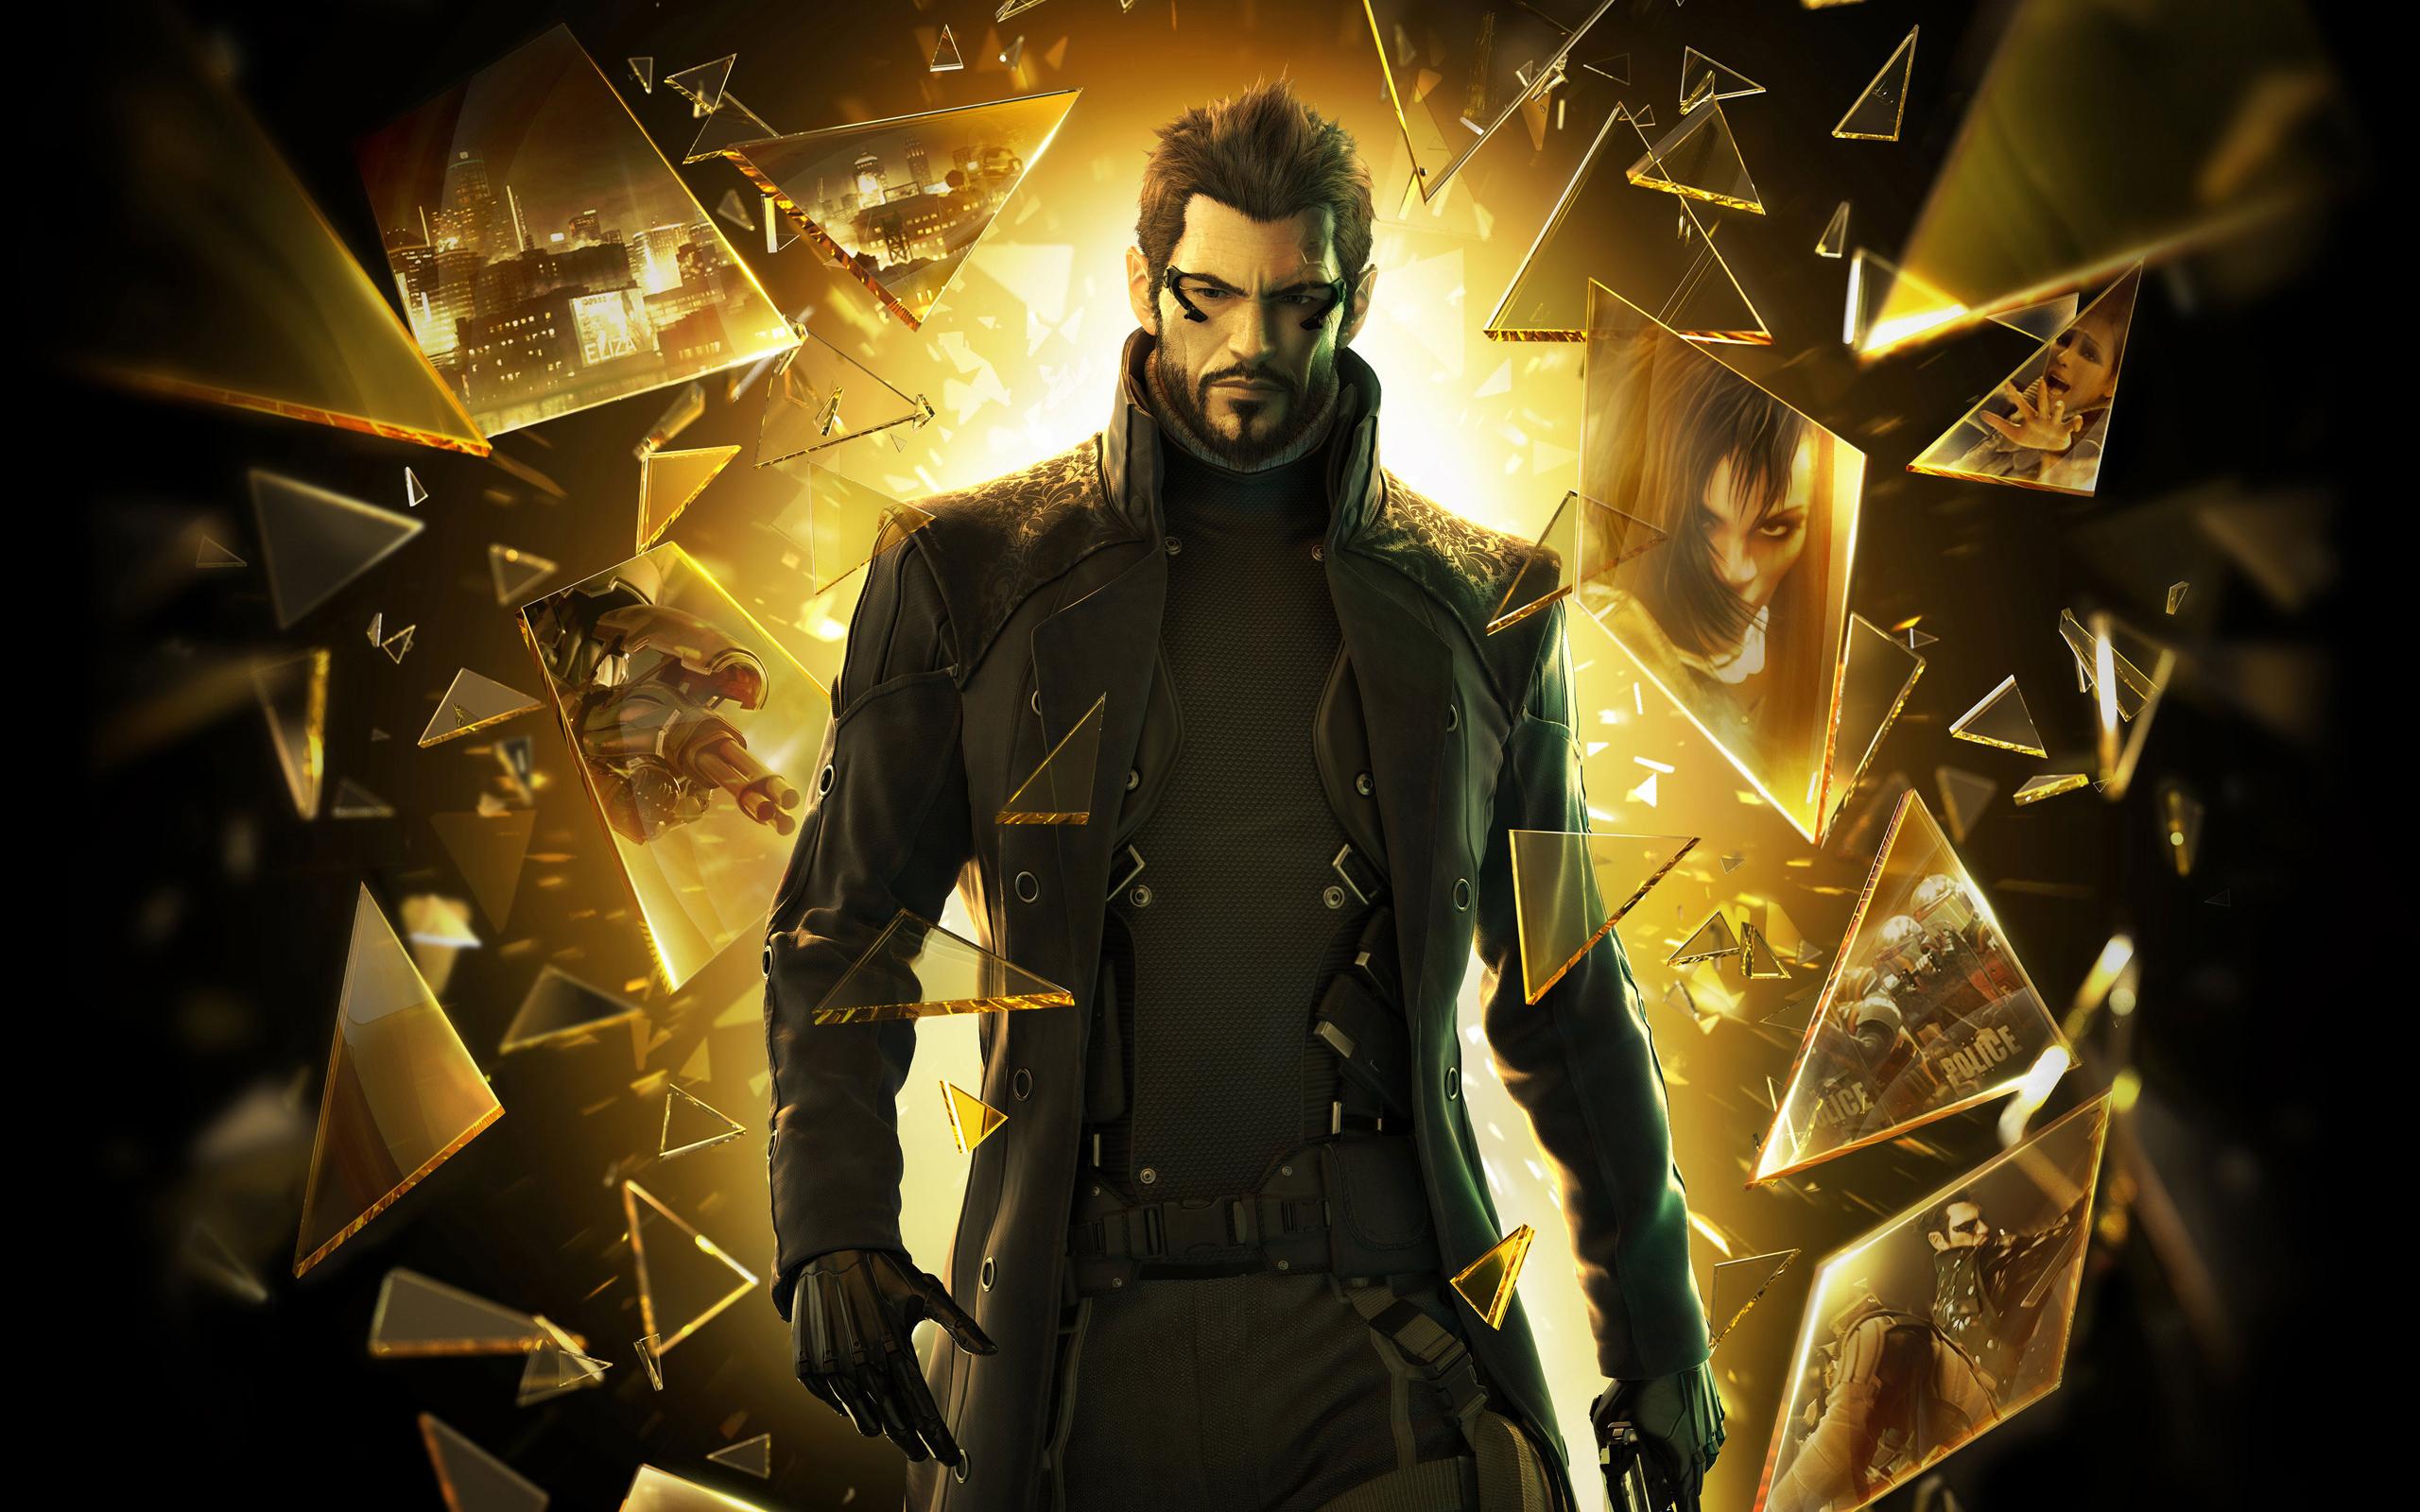 Deus Ex Human Revolution Game Wallpapers HD Wallpapers 2560x1600